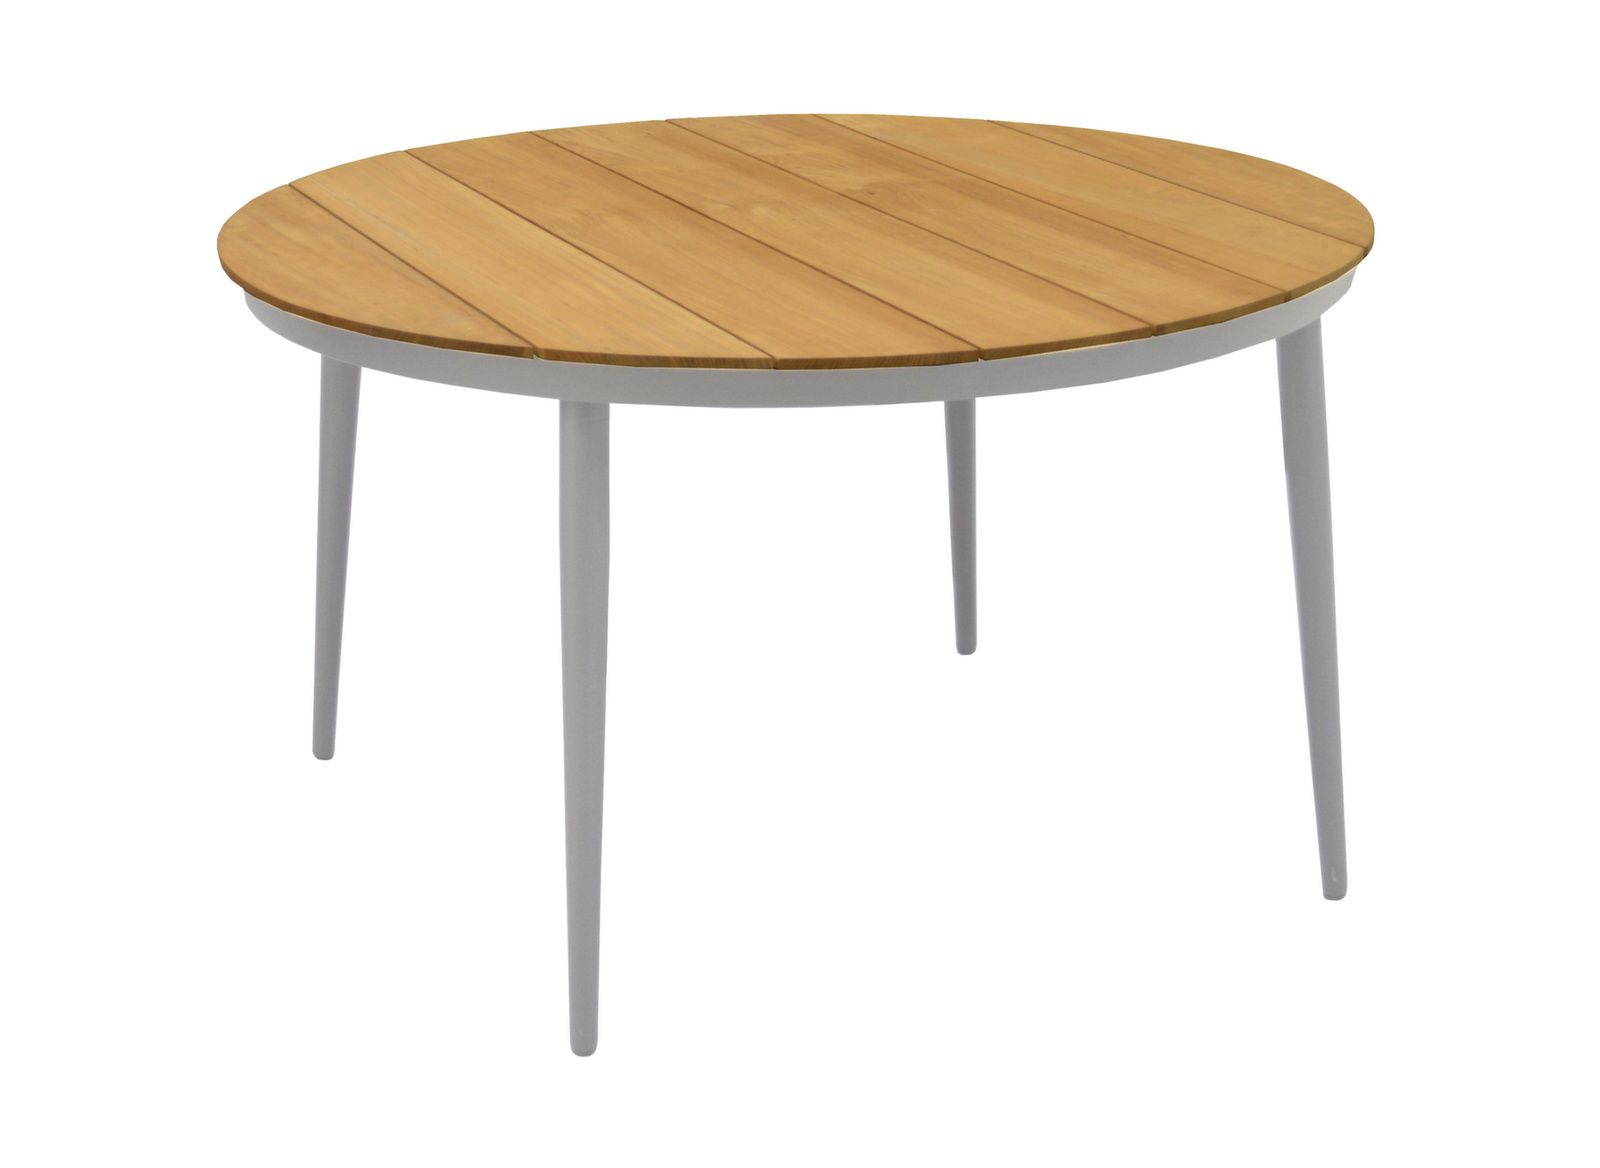 Table Neuvic ø 130 cm, plateau Teck